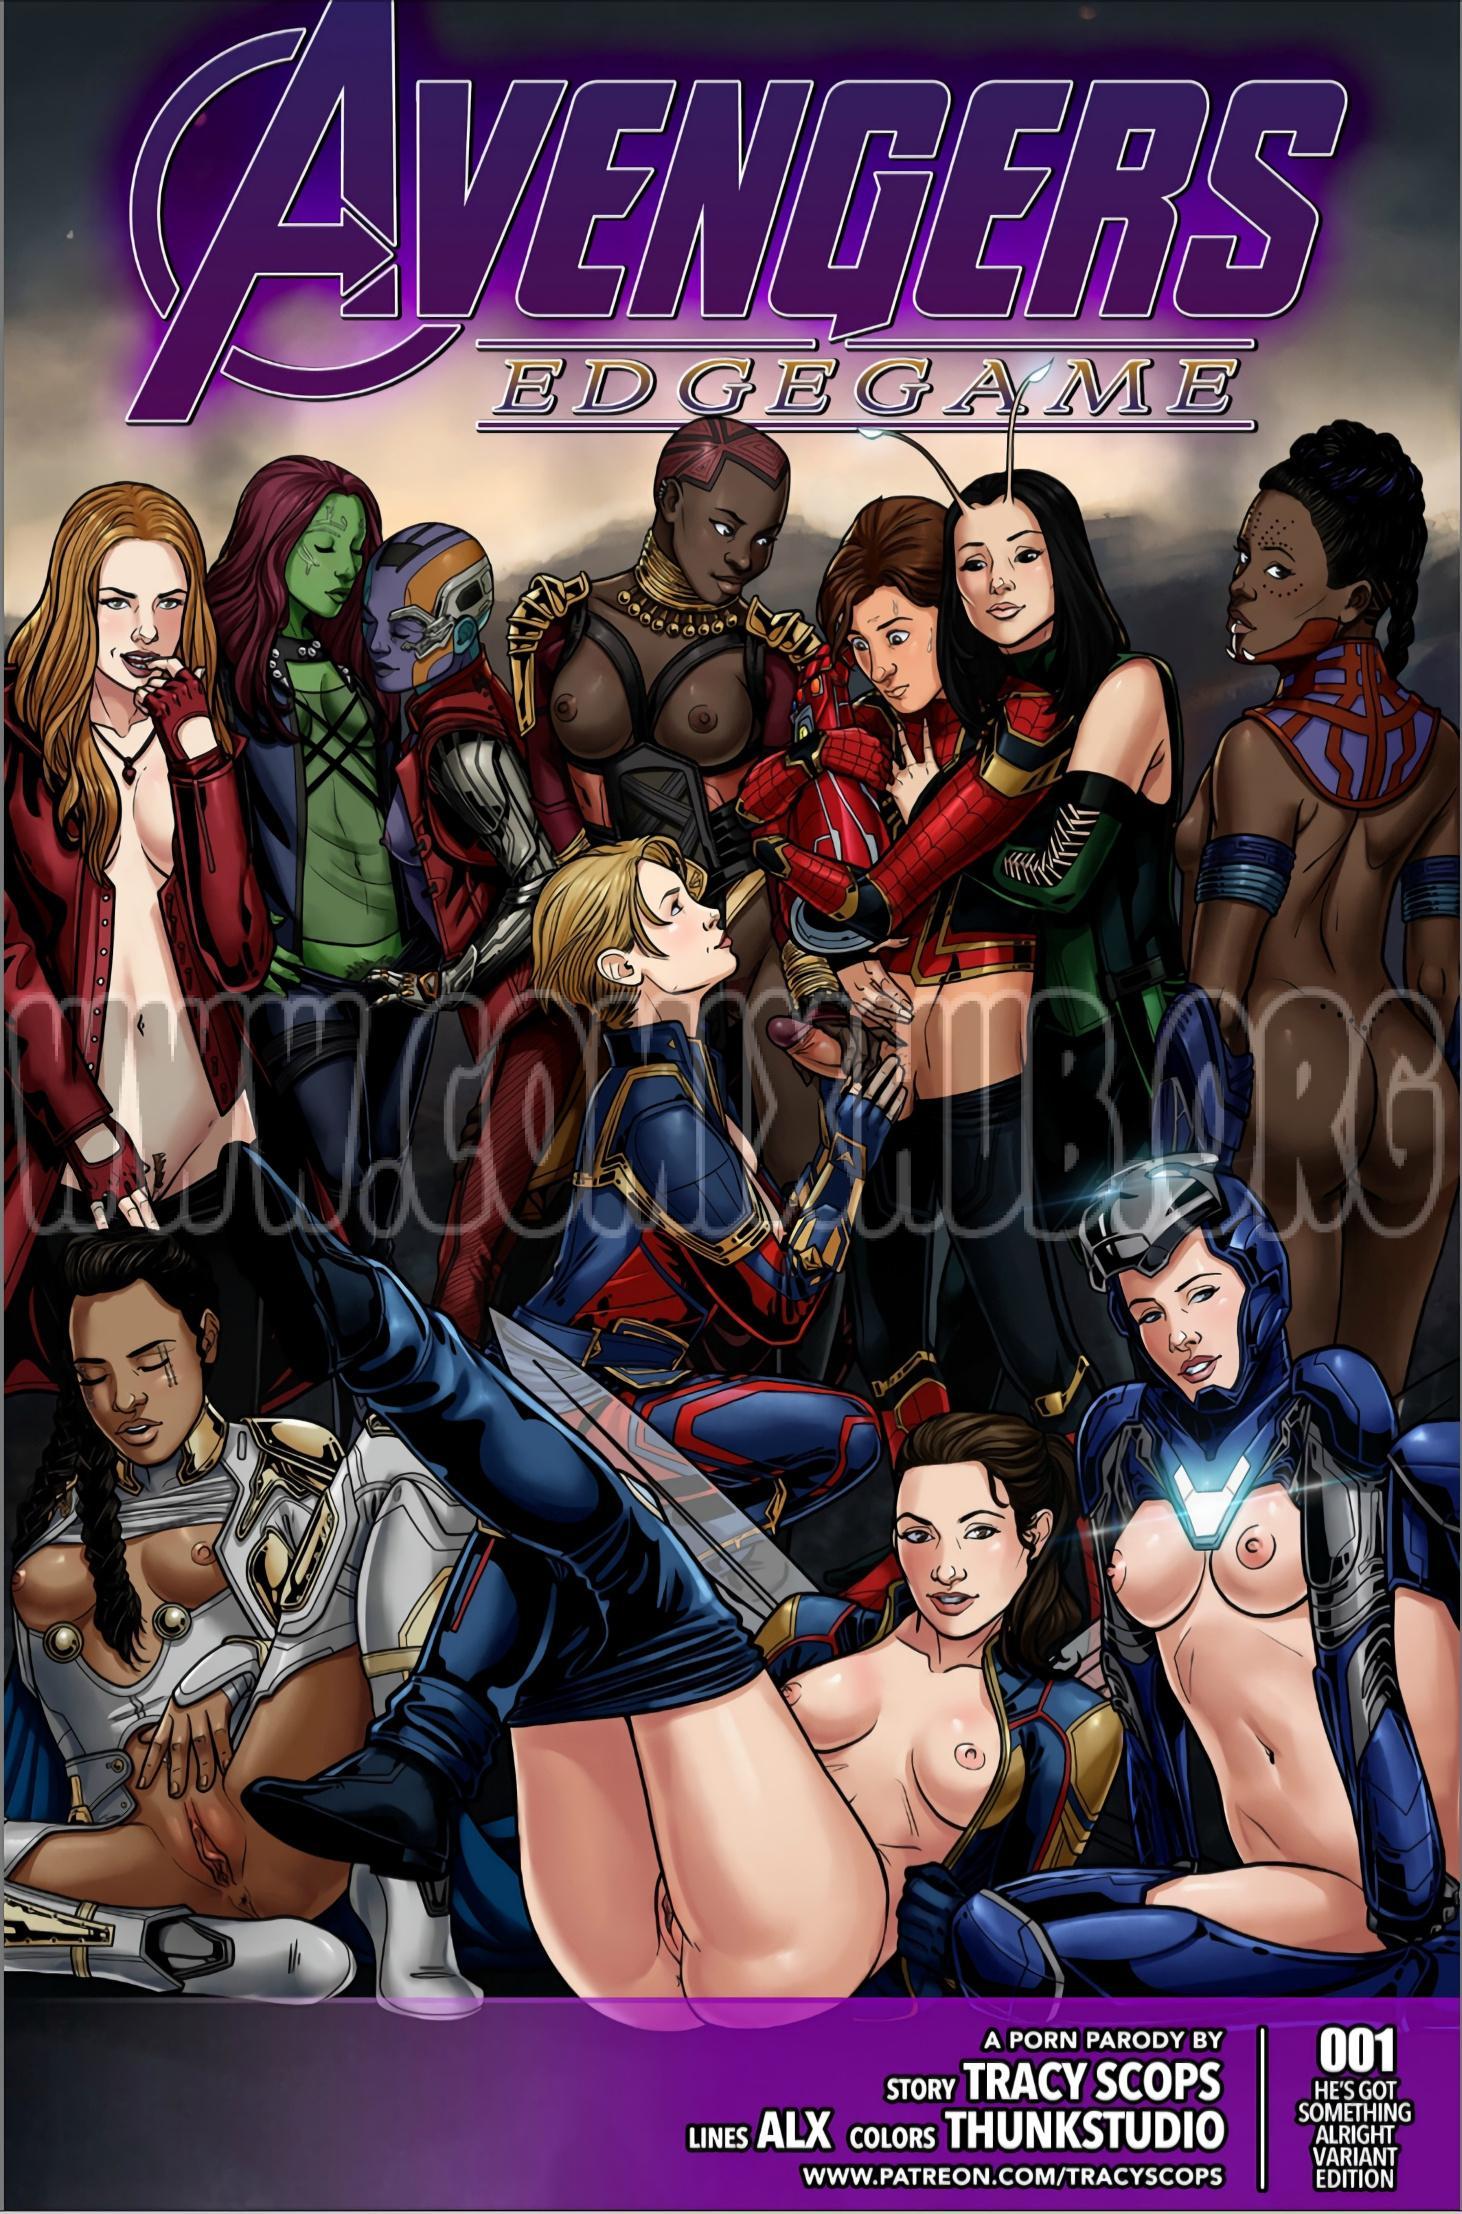 Avengers Edge Game porn comics Aliens, Anal Sex, Blowjob, Creampie, Cum Shots, cunnilingus, Gangbang, Group Sex, Masturbation, Oral sex, Sex and Magic, Sex Toys, Straight